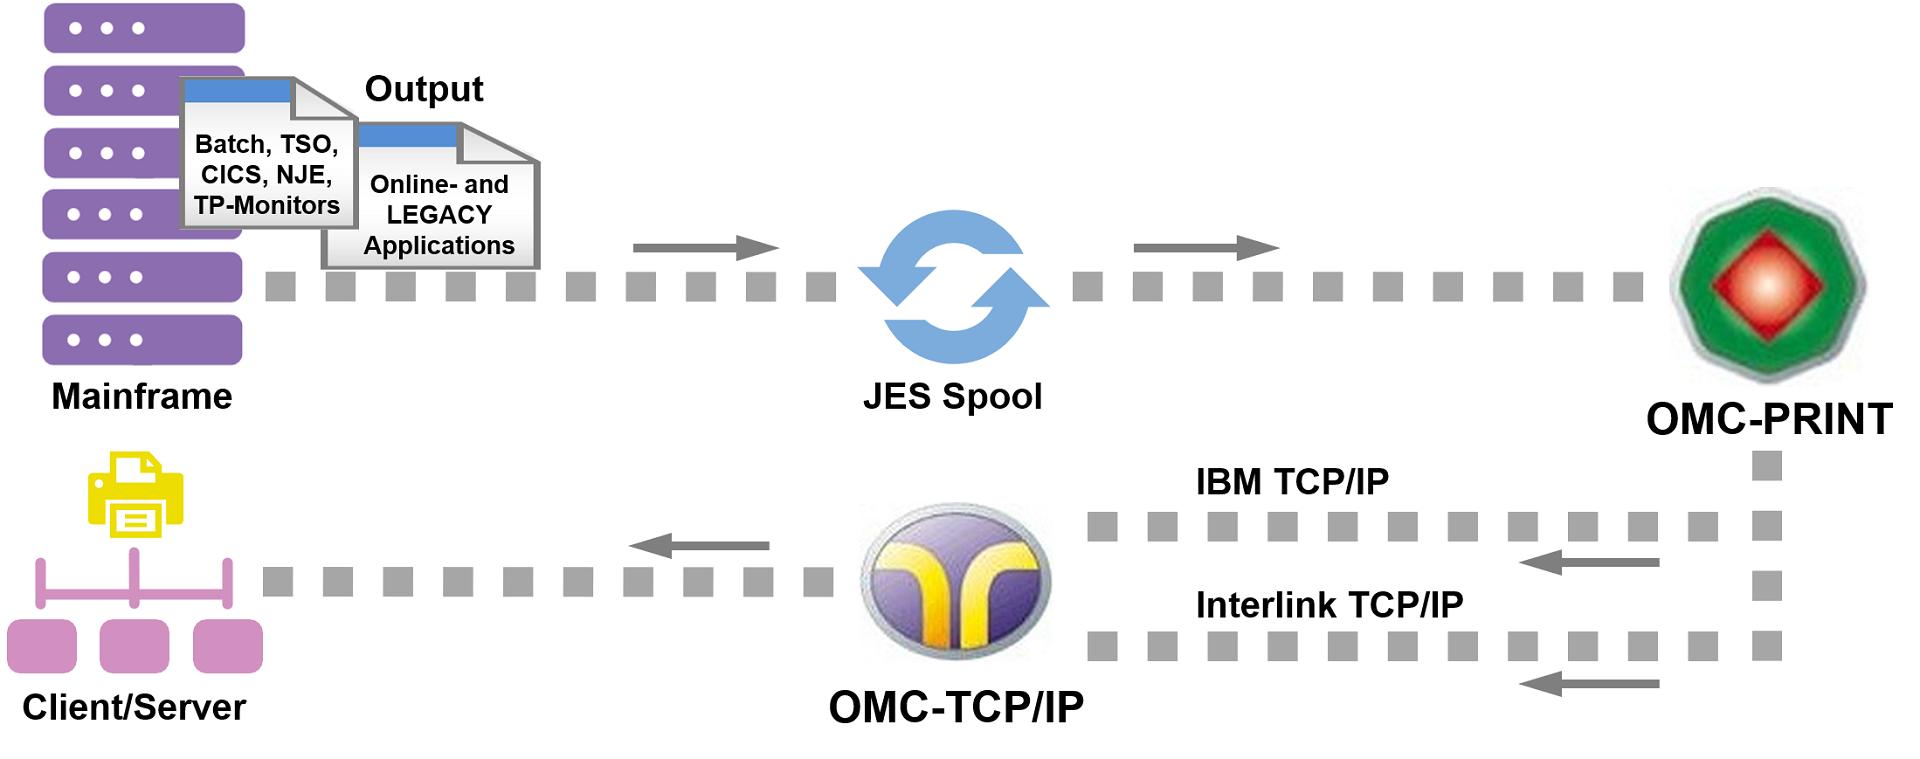 OMC-PRINT Topology TCP/IP